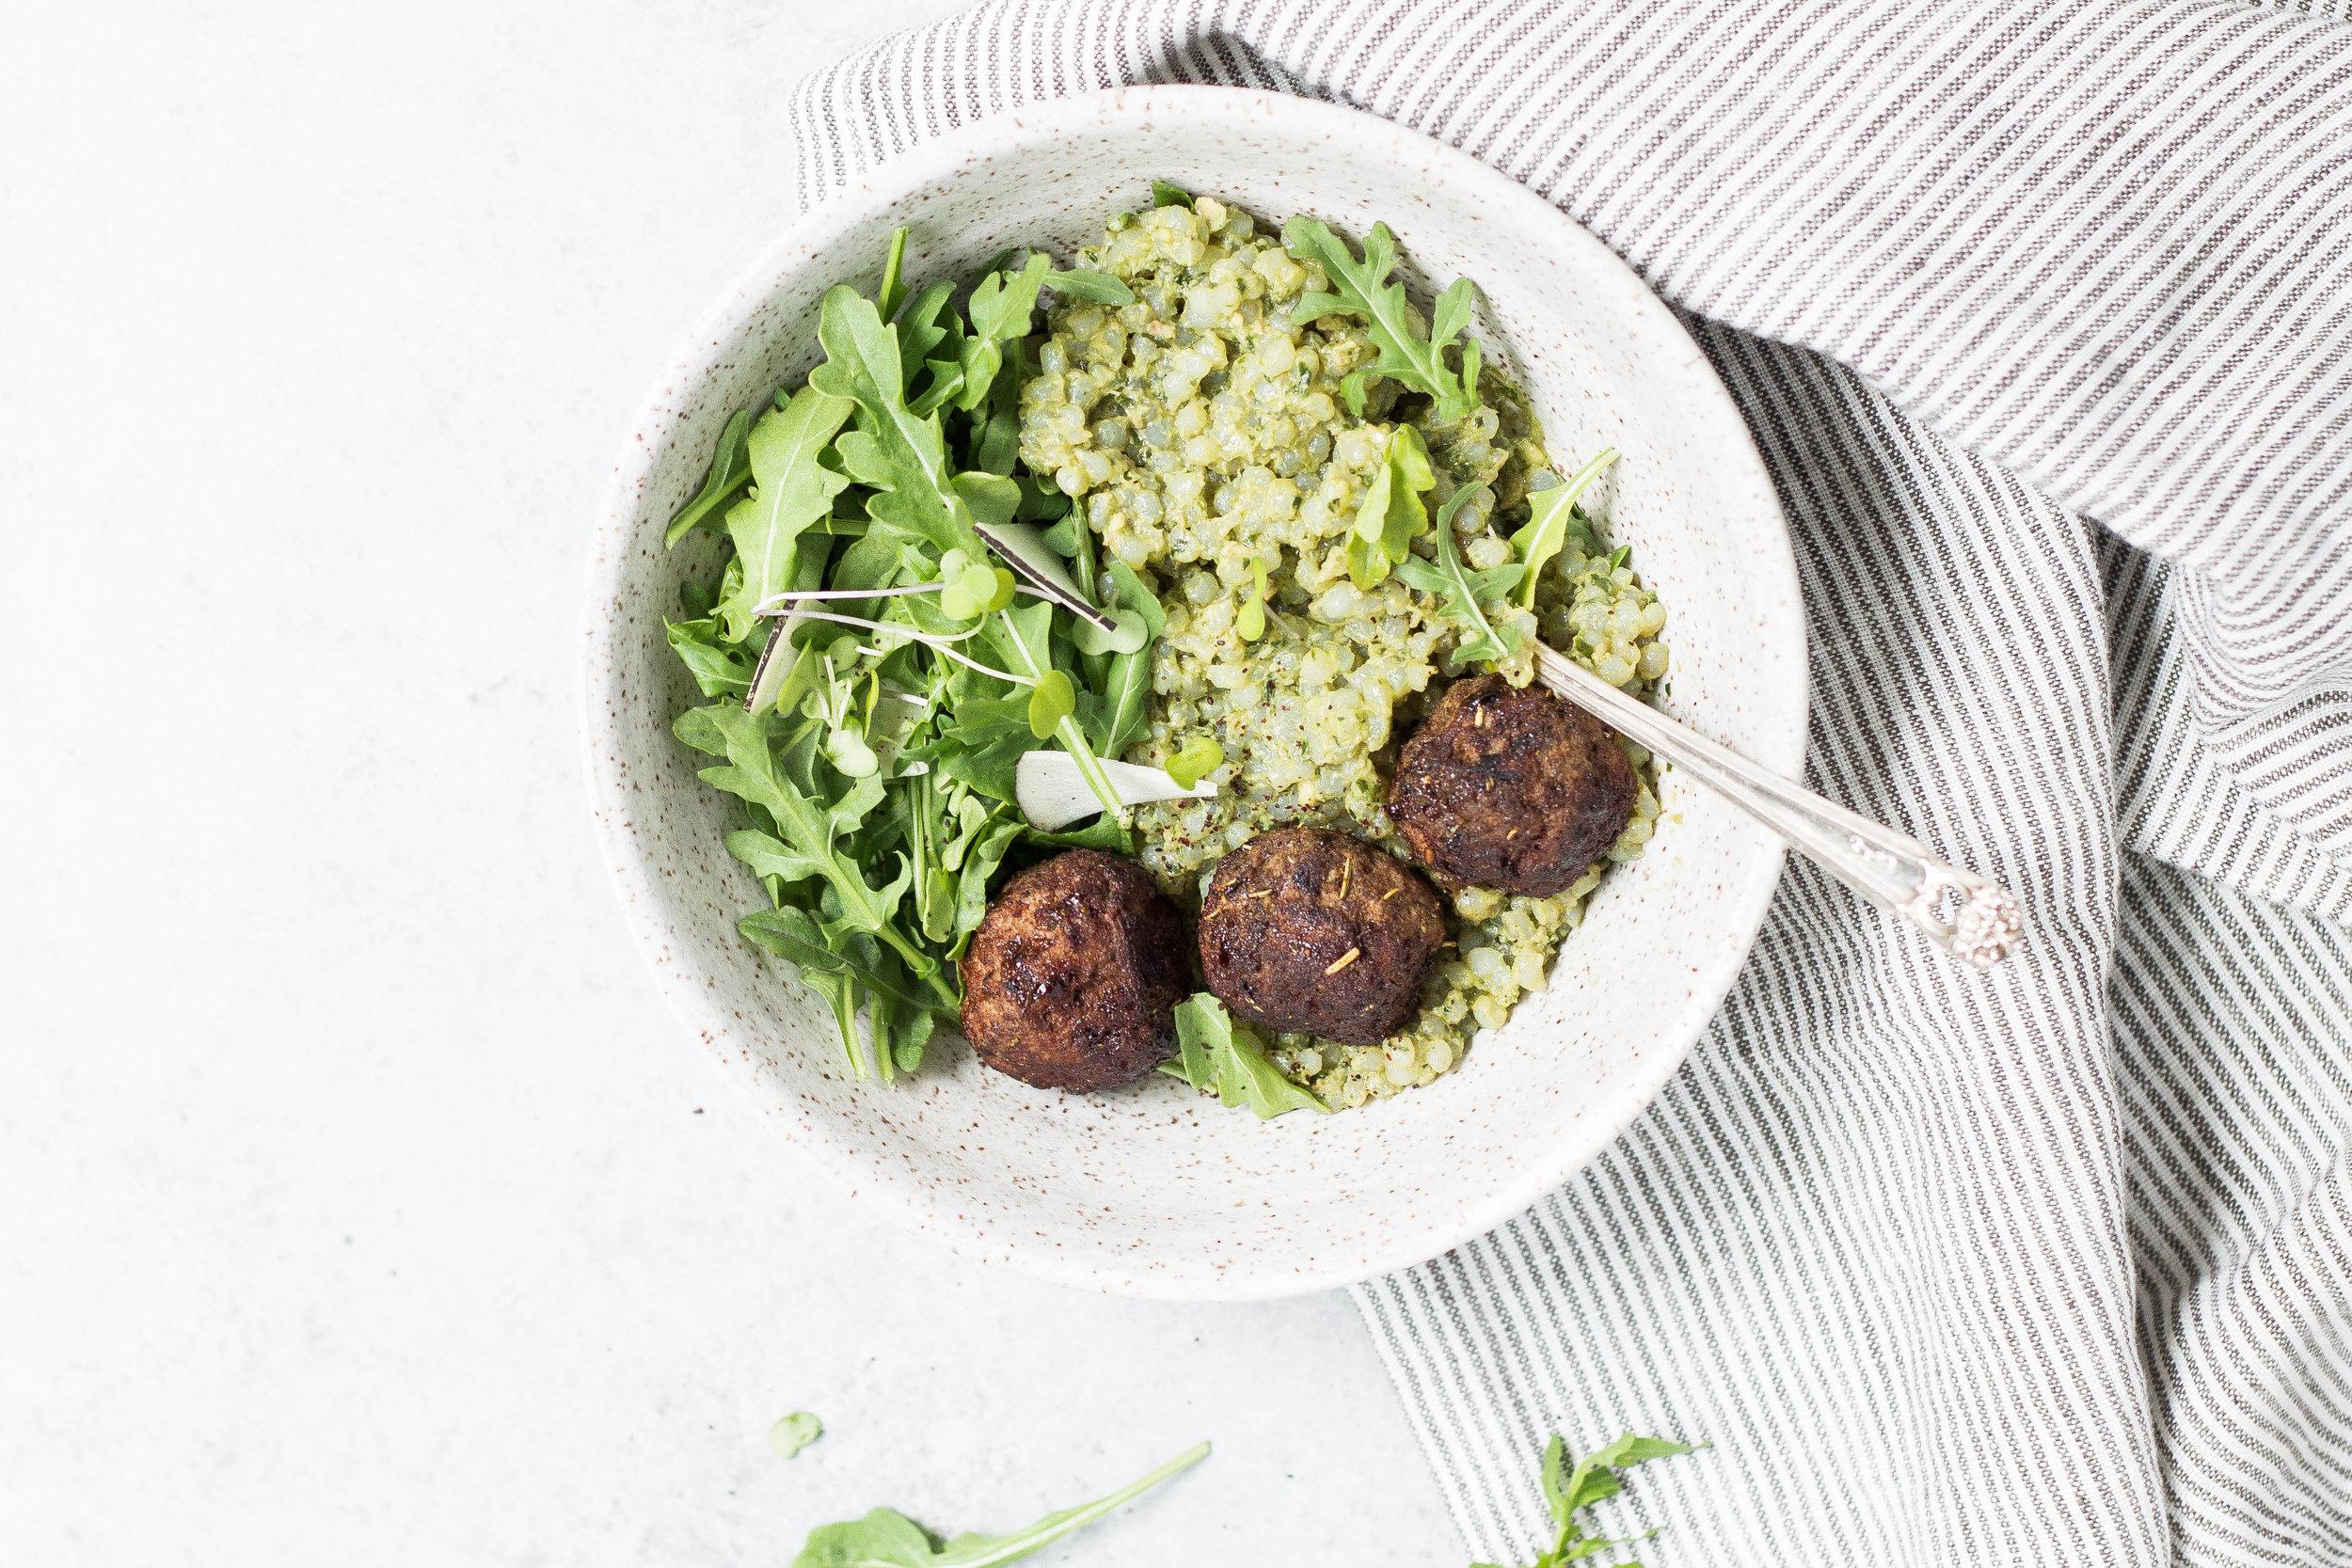 Easy Meatballs & Grain-free Pesto Risotto (AIP, Paleo, Low FODMAP friendly)